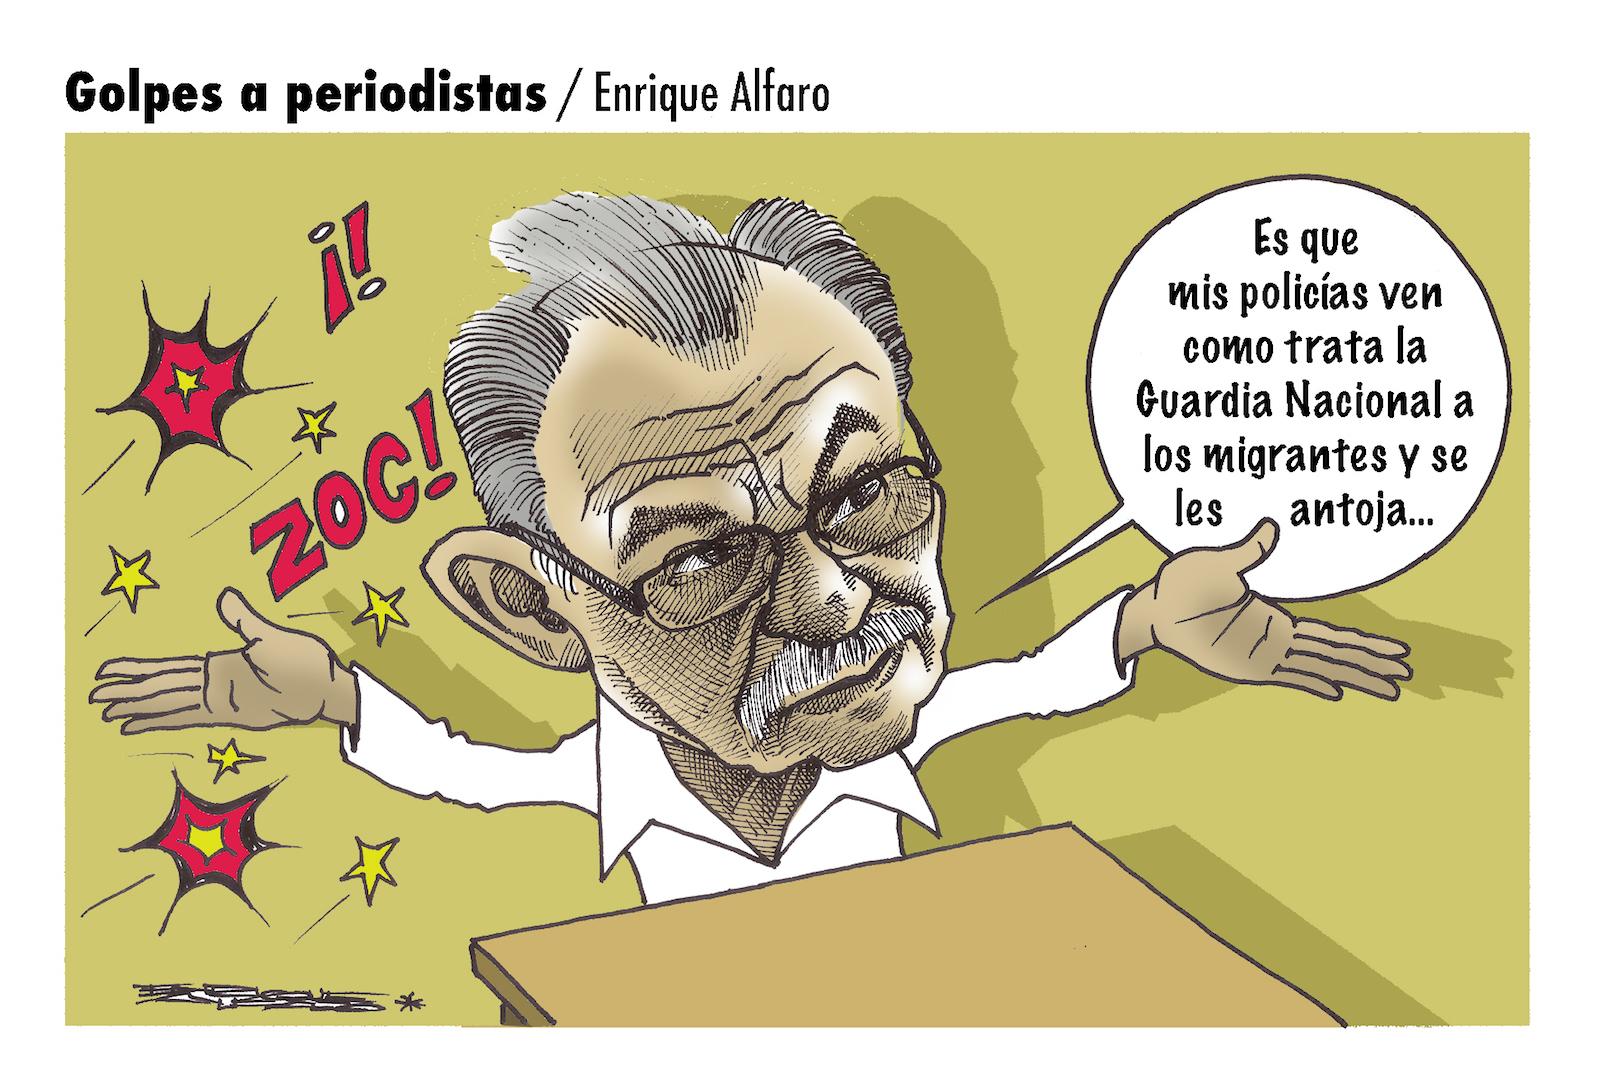 Golpes a periodistas / Enrique Alfaro